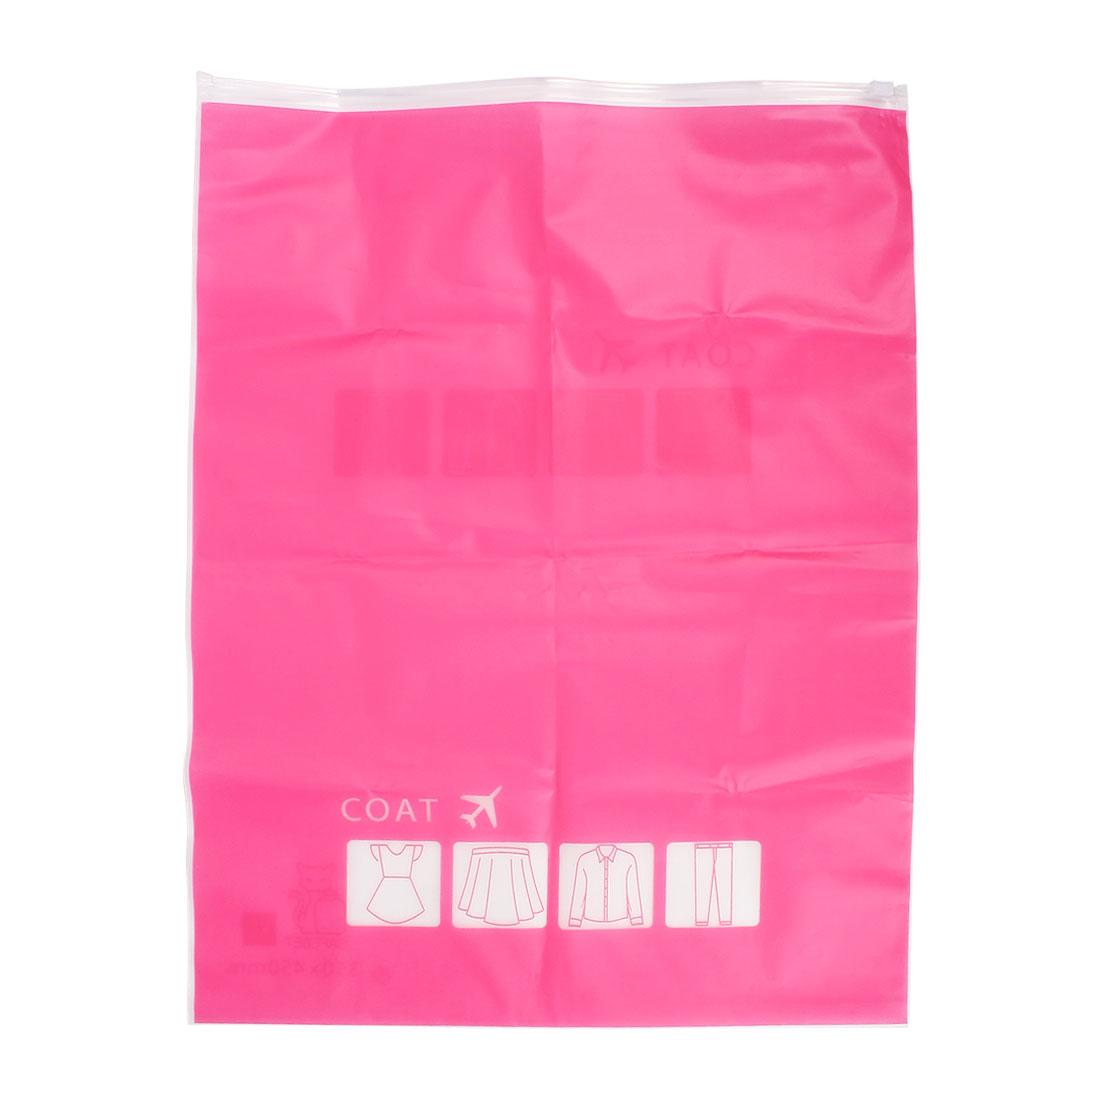 Plastic Water Resistant Travel Clothes Underwear Storage Bag 28x40cm Fuchsia - image 3 de 8